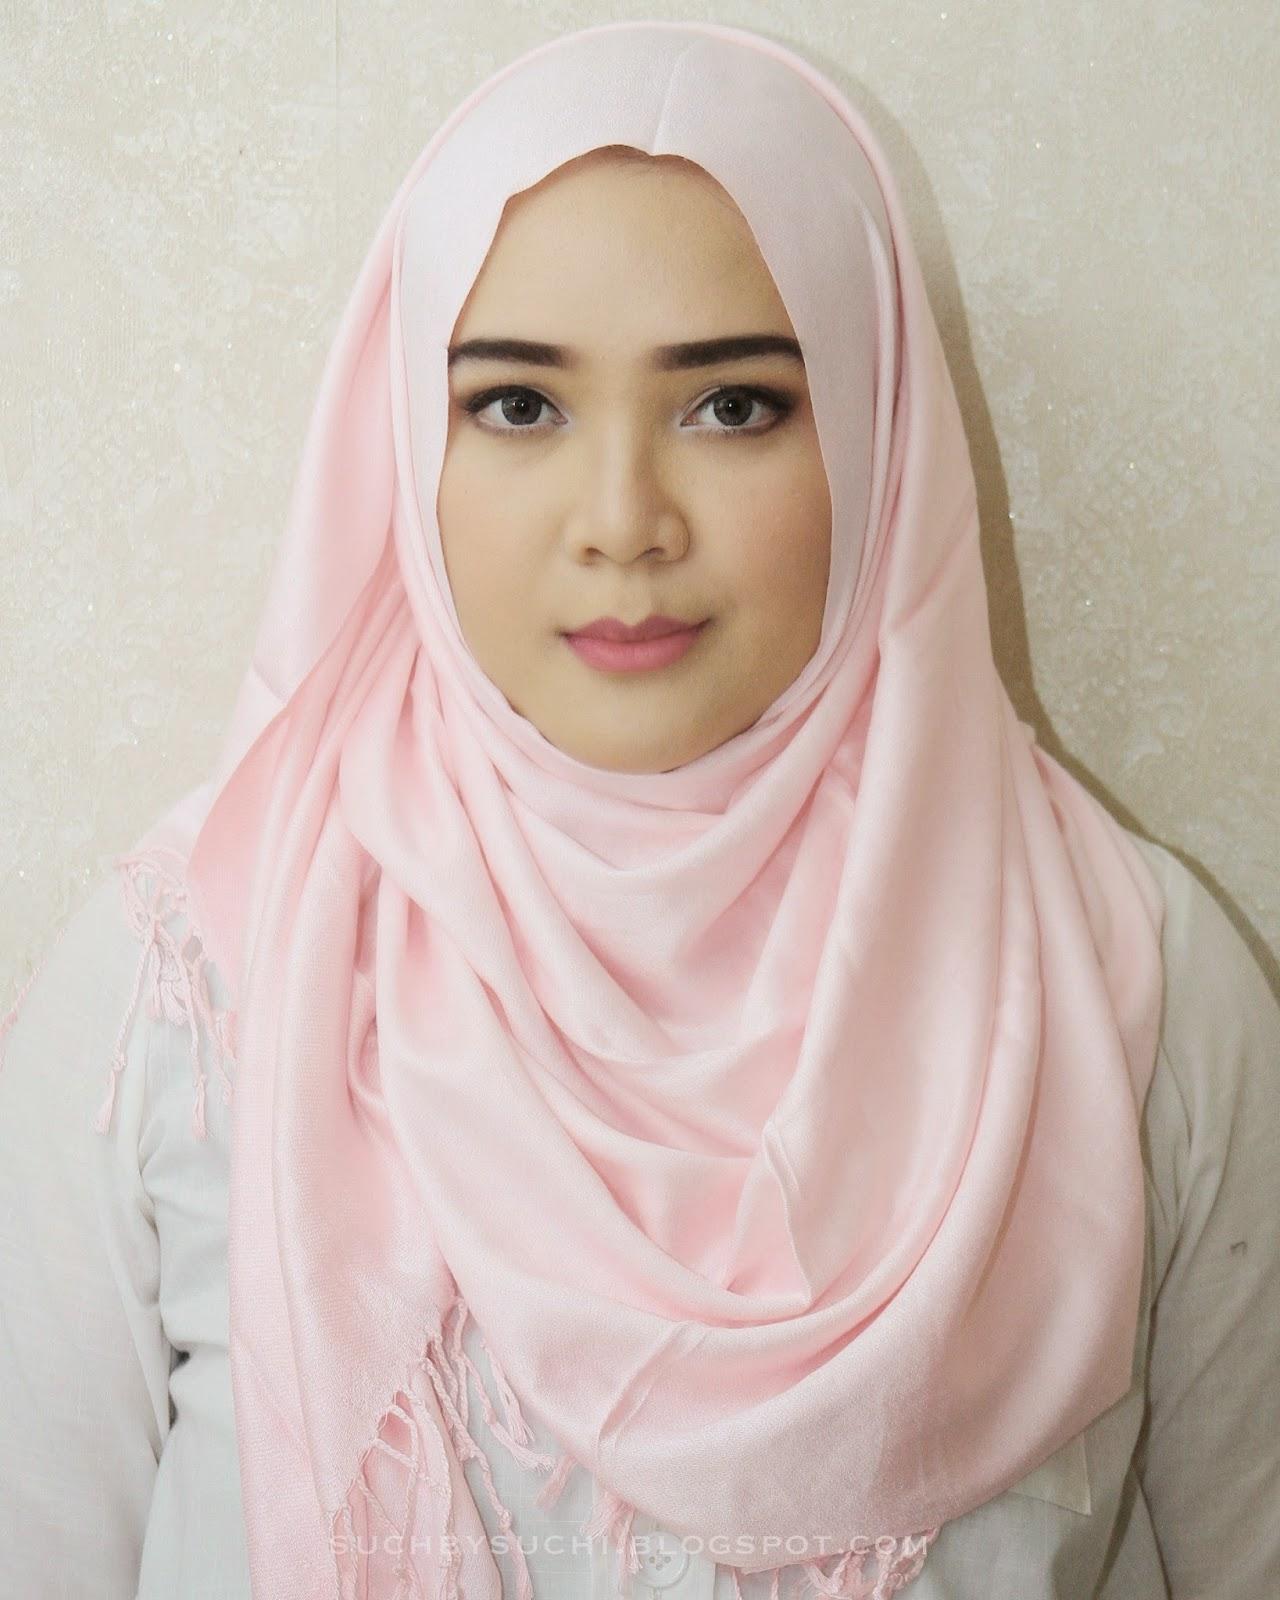 100 Kreasi Jilbab Segi Empat Untuk Ke Kampus Dan Kuliah Terbaru